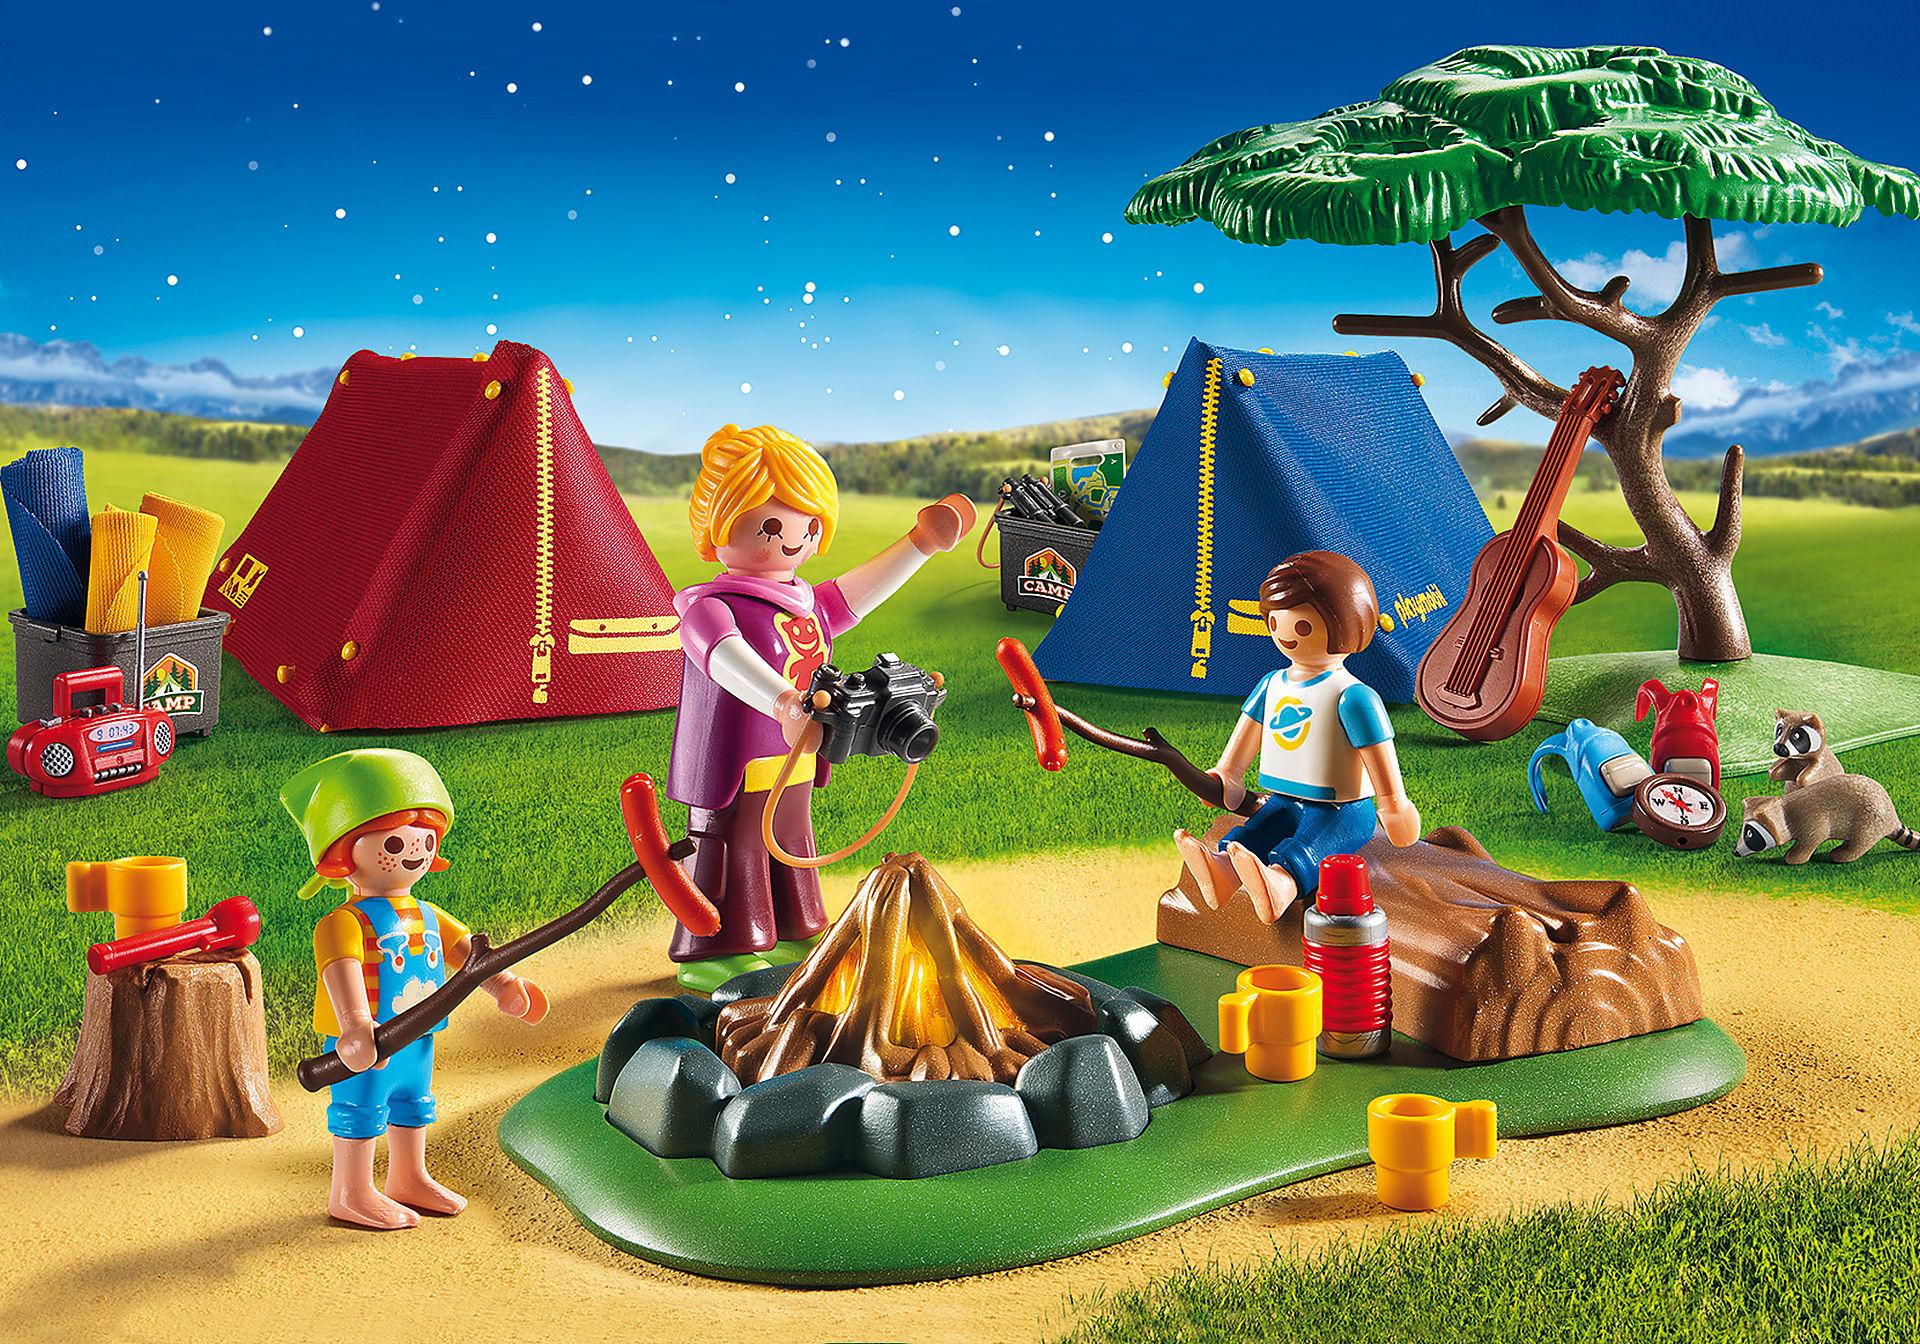 http://media.playmobil.com/i/playmobil/6888_product_detail/Tentes avec enfants et animatrice